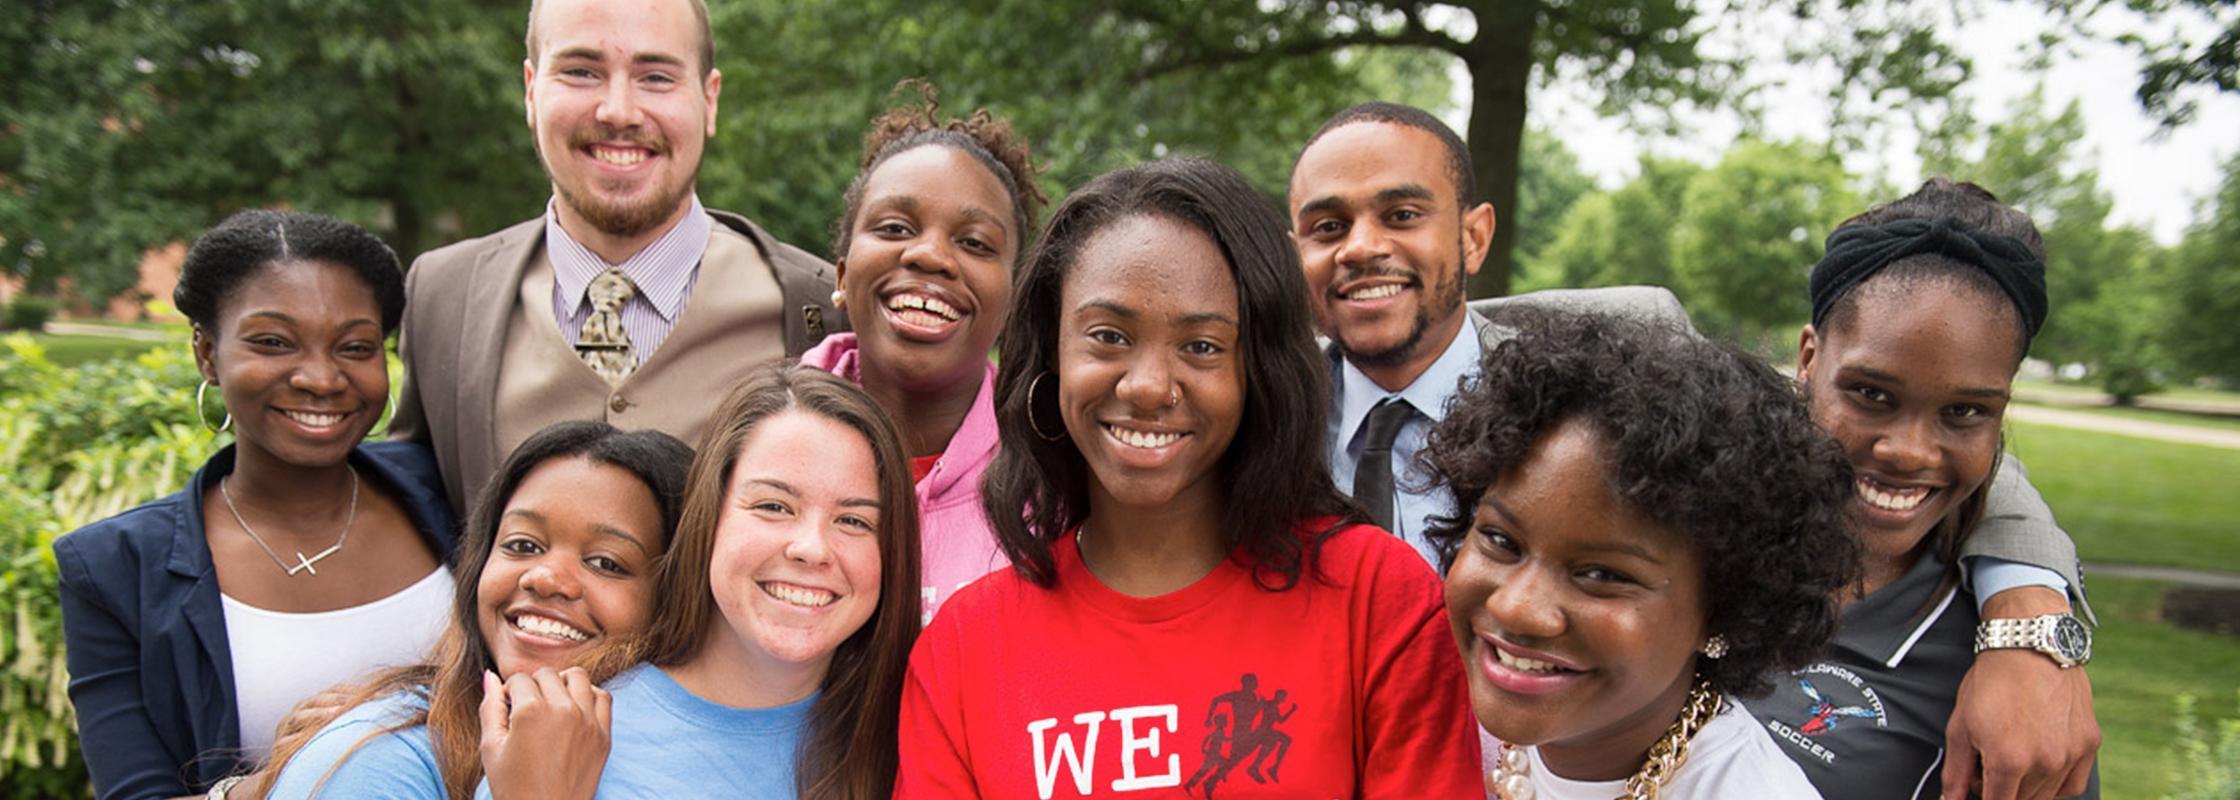 Group of DSU students